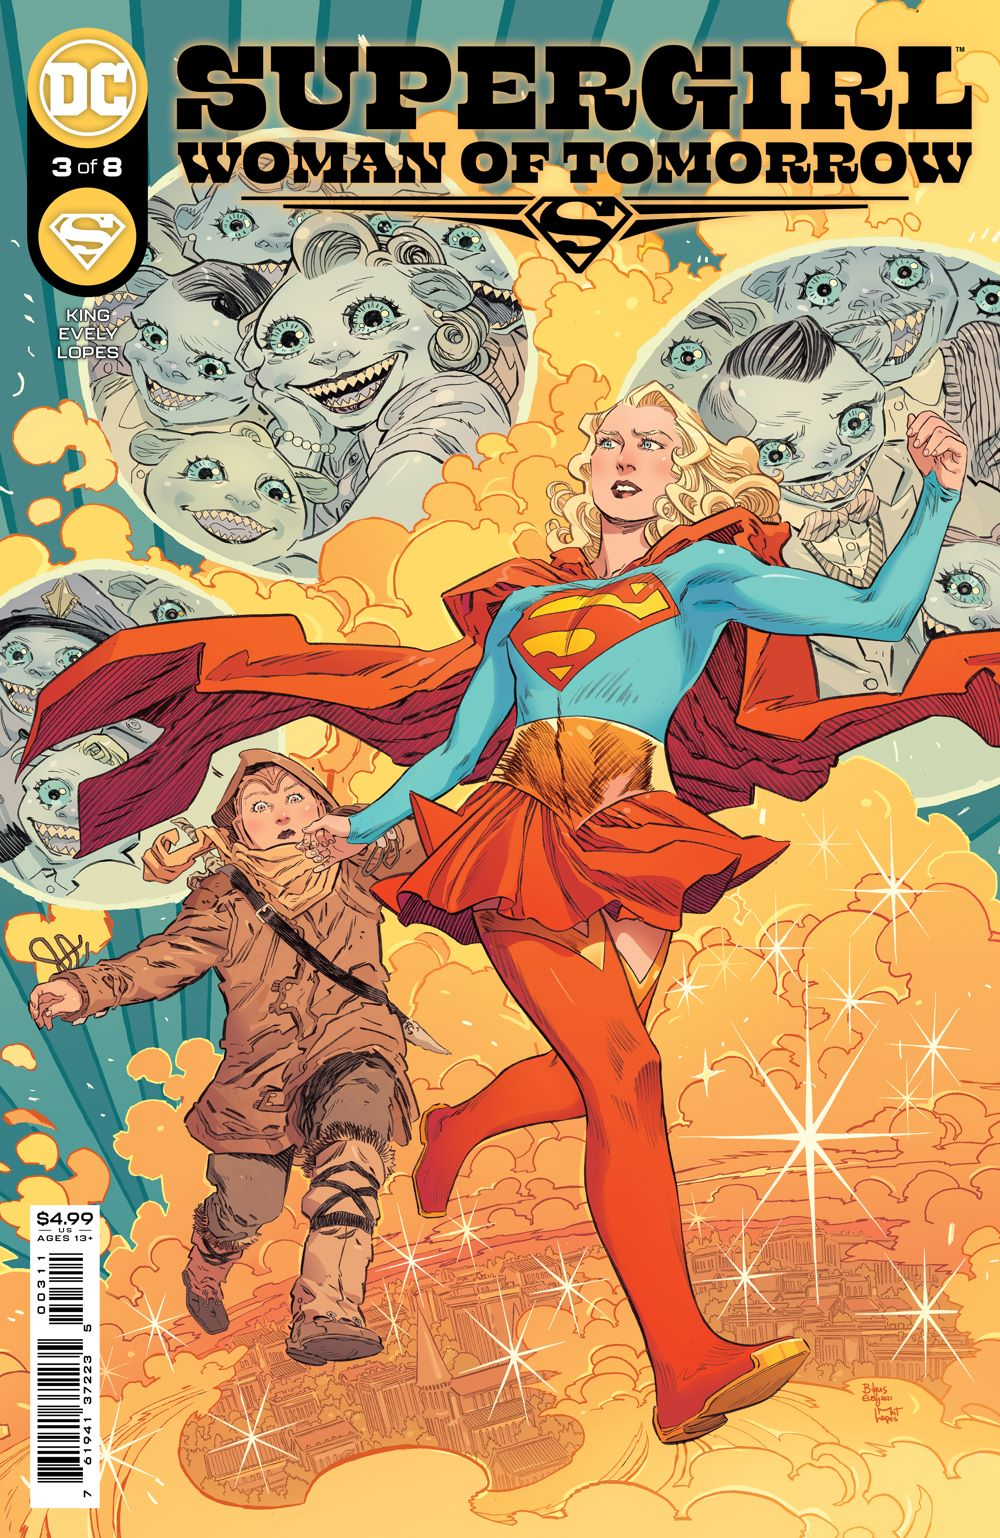 SG_WOT_Cv3 DC Comics August 2021 Solicitations